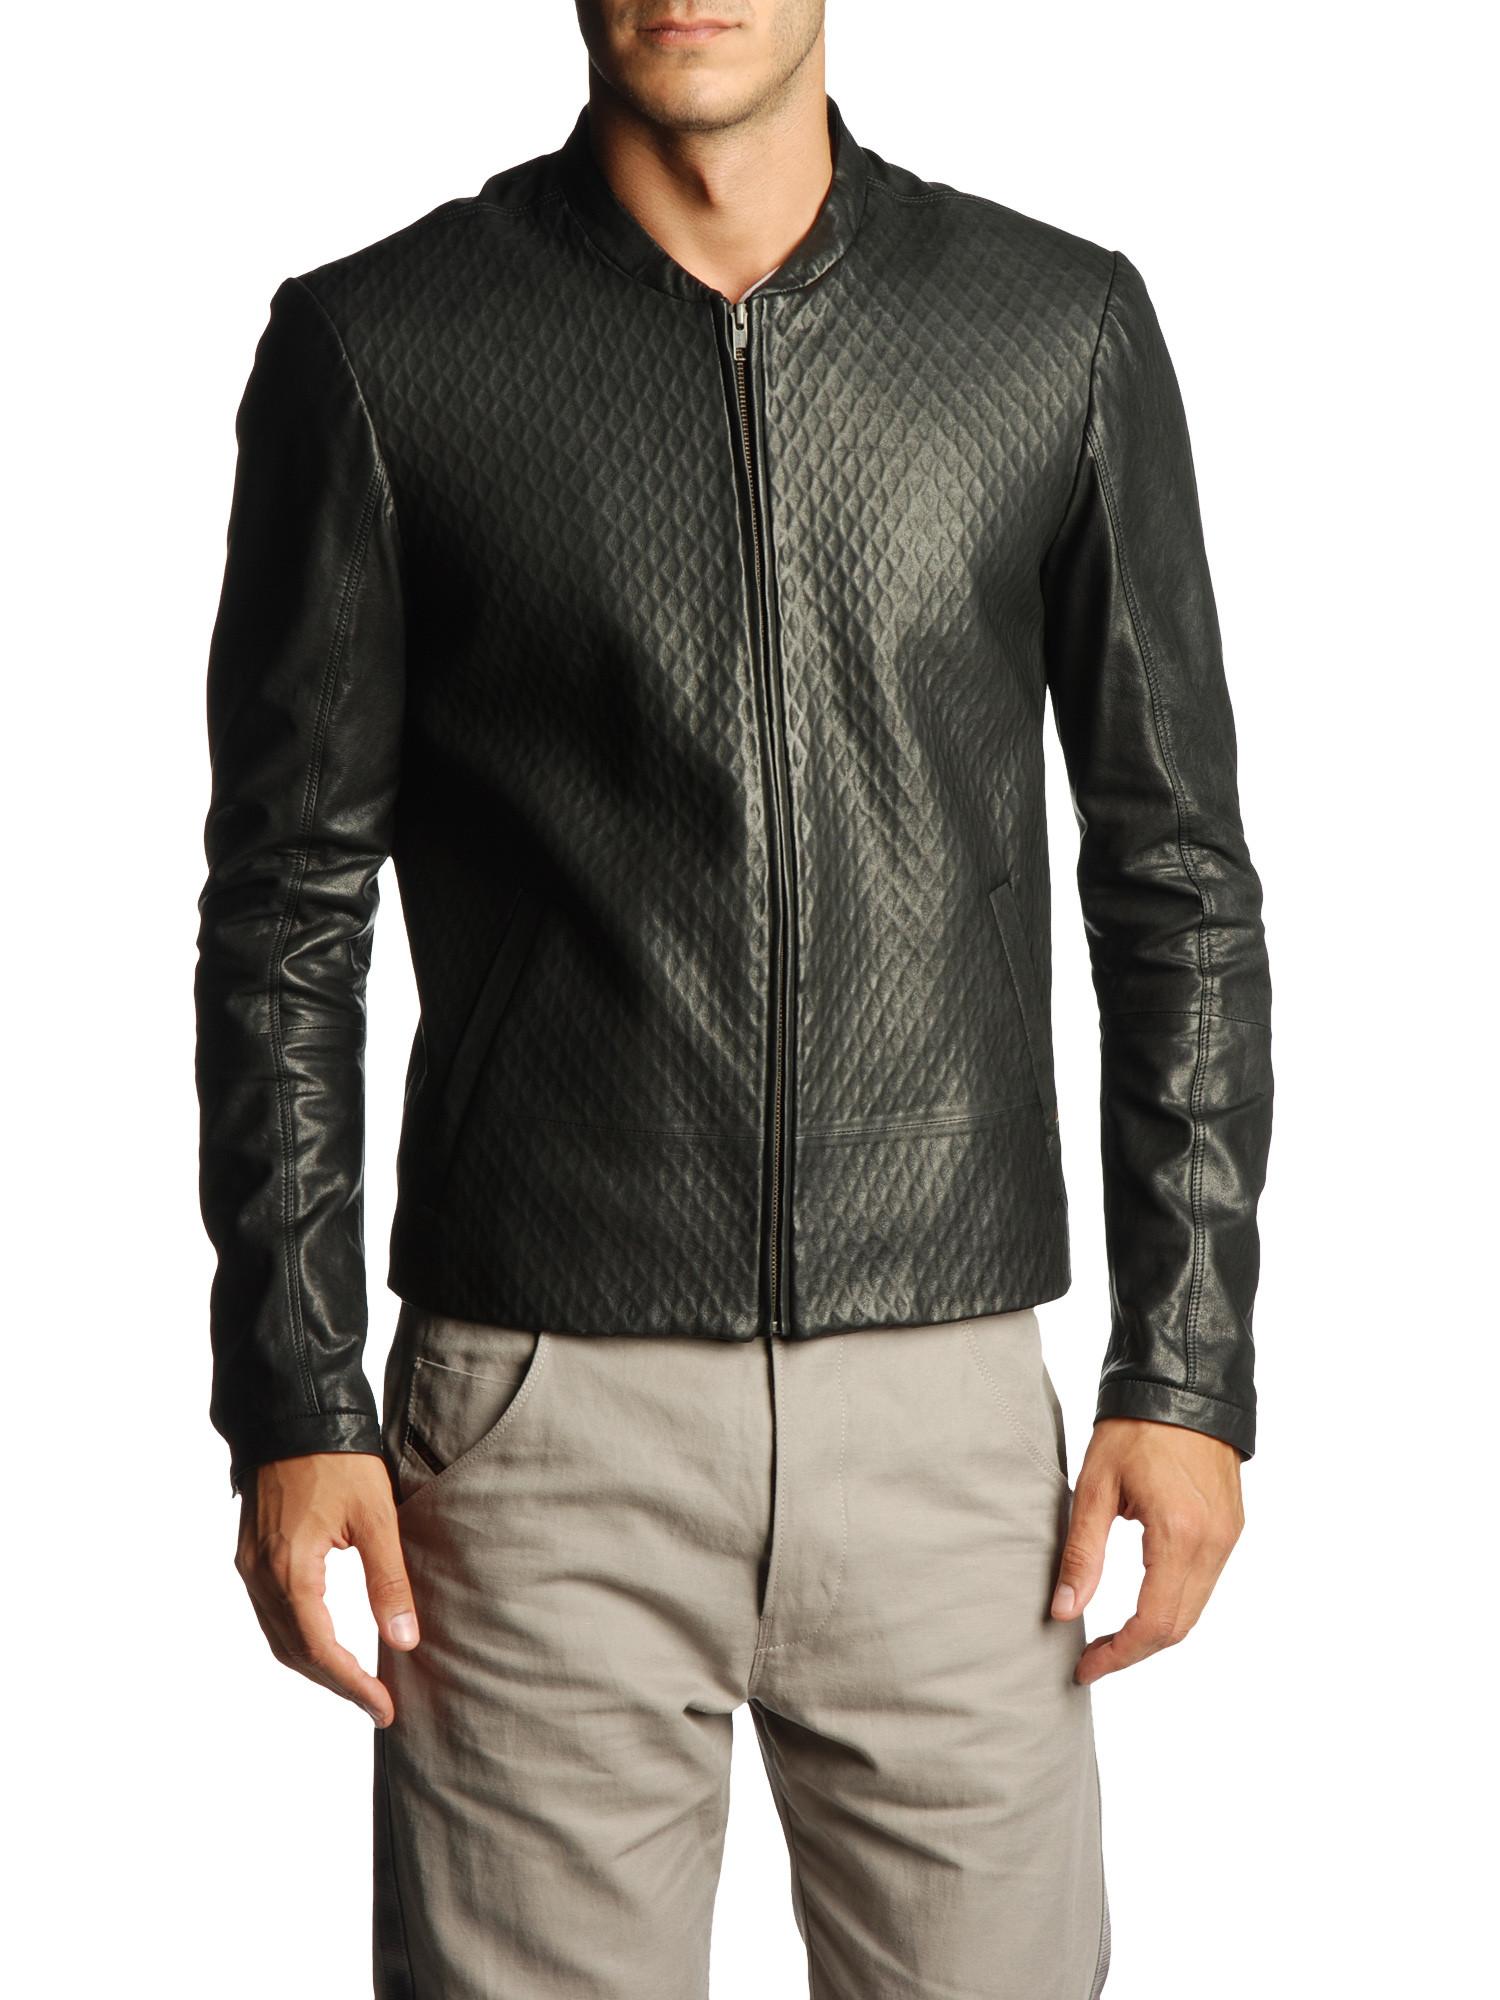 цена Одежда из кожи Diesel  BLAC GOLD LENSI онлайн в 2017 году